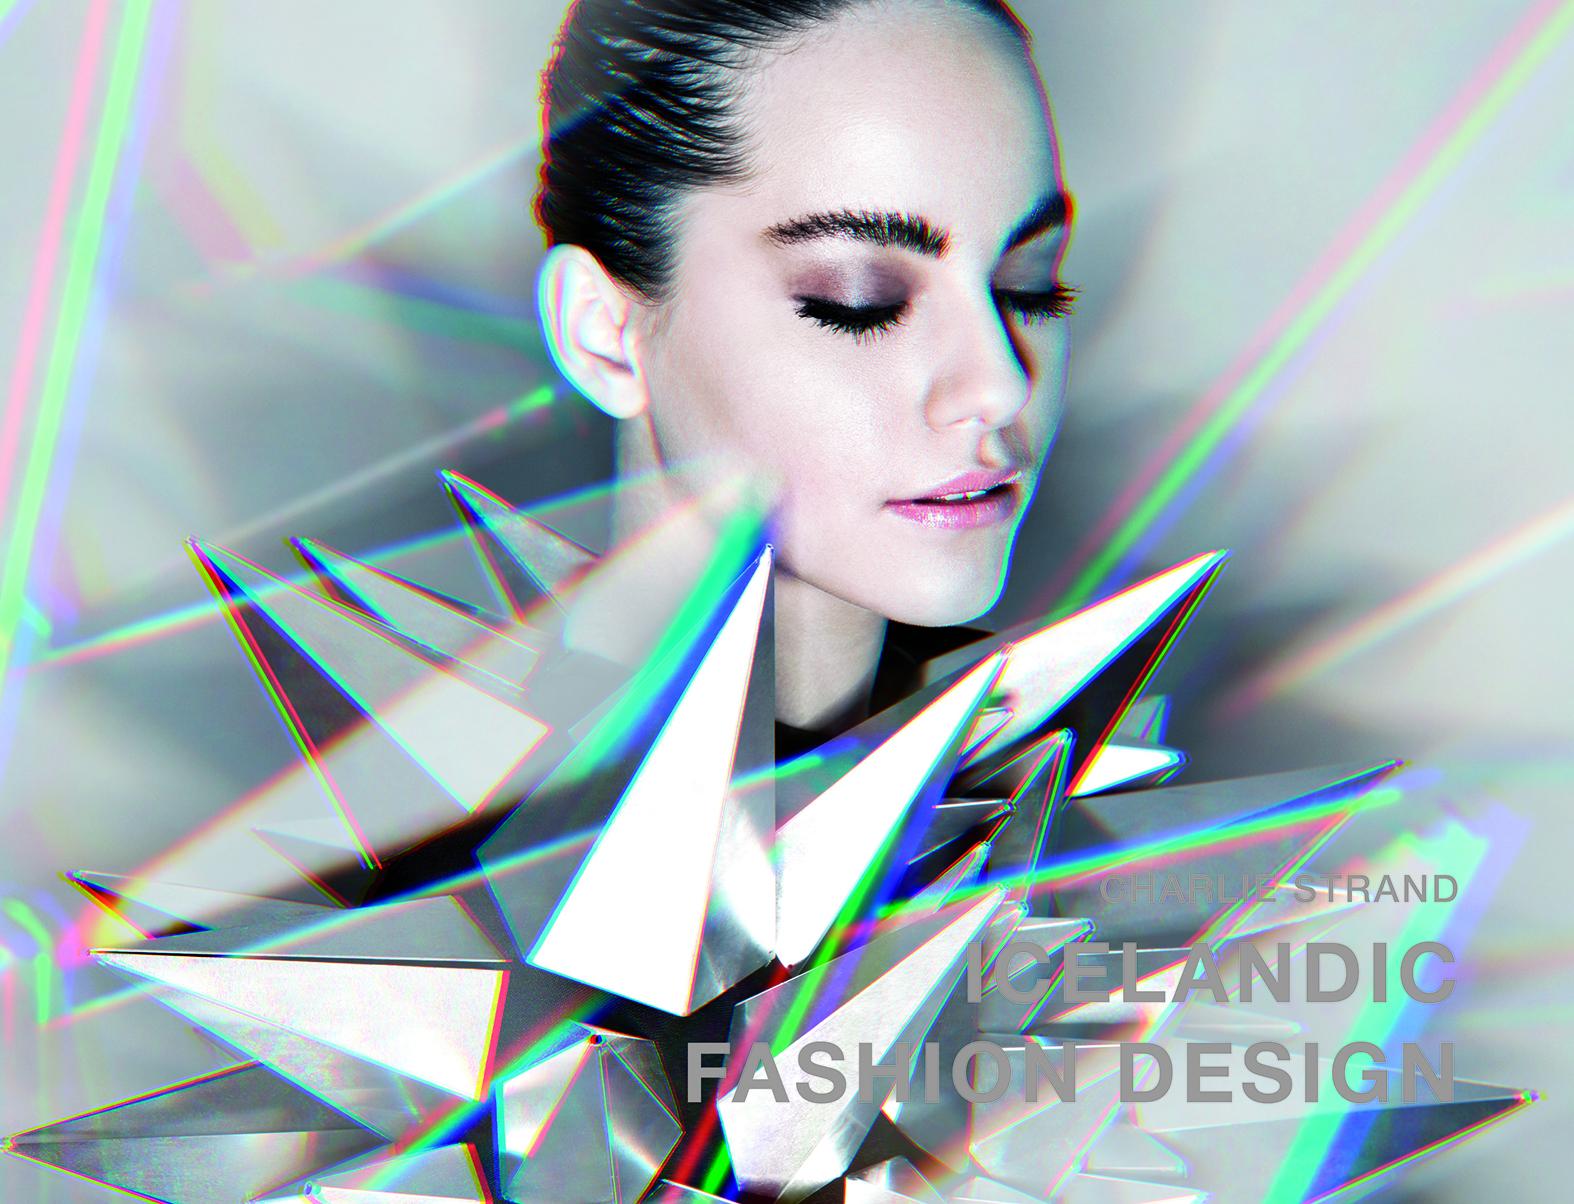 Icelandic Fashion Design